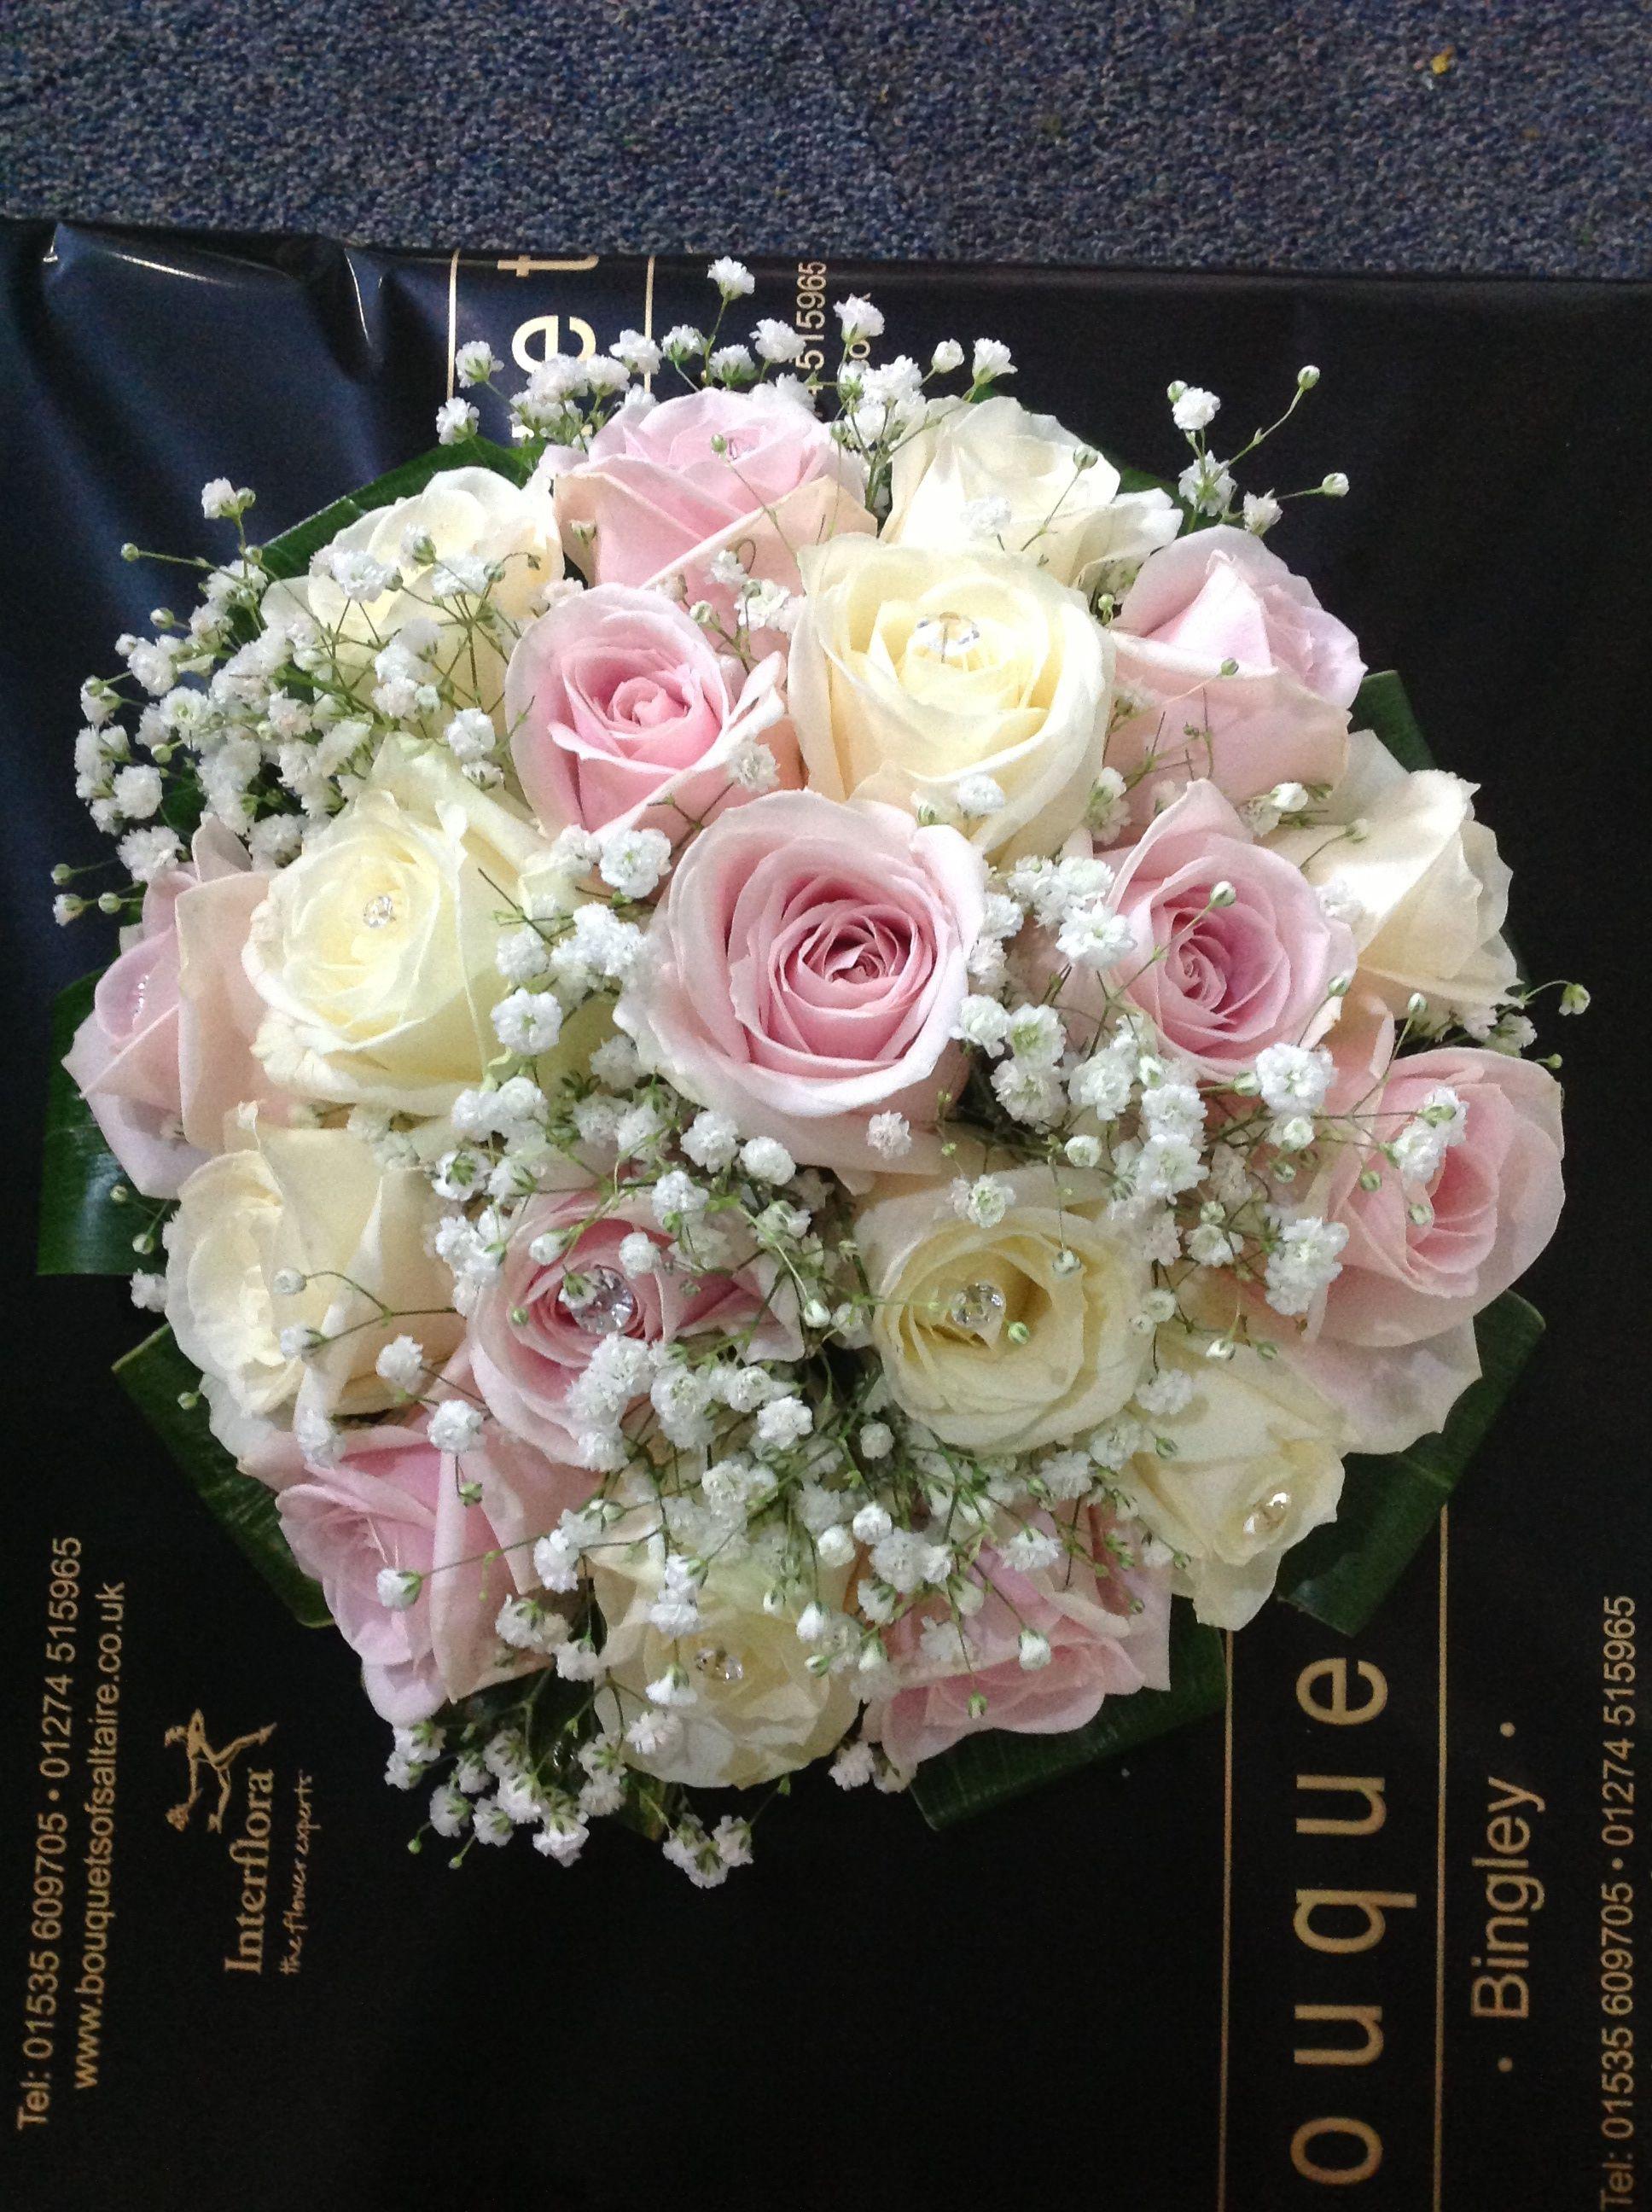 Vintage rose & gypsophila bridal bouquet #fallbridalbouquets